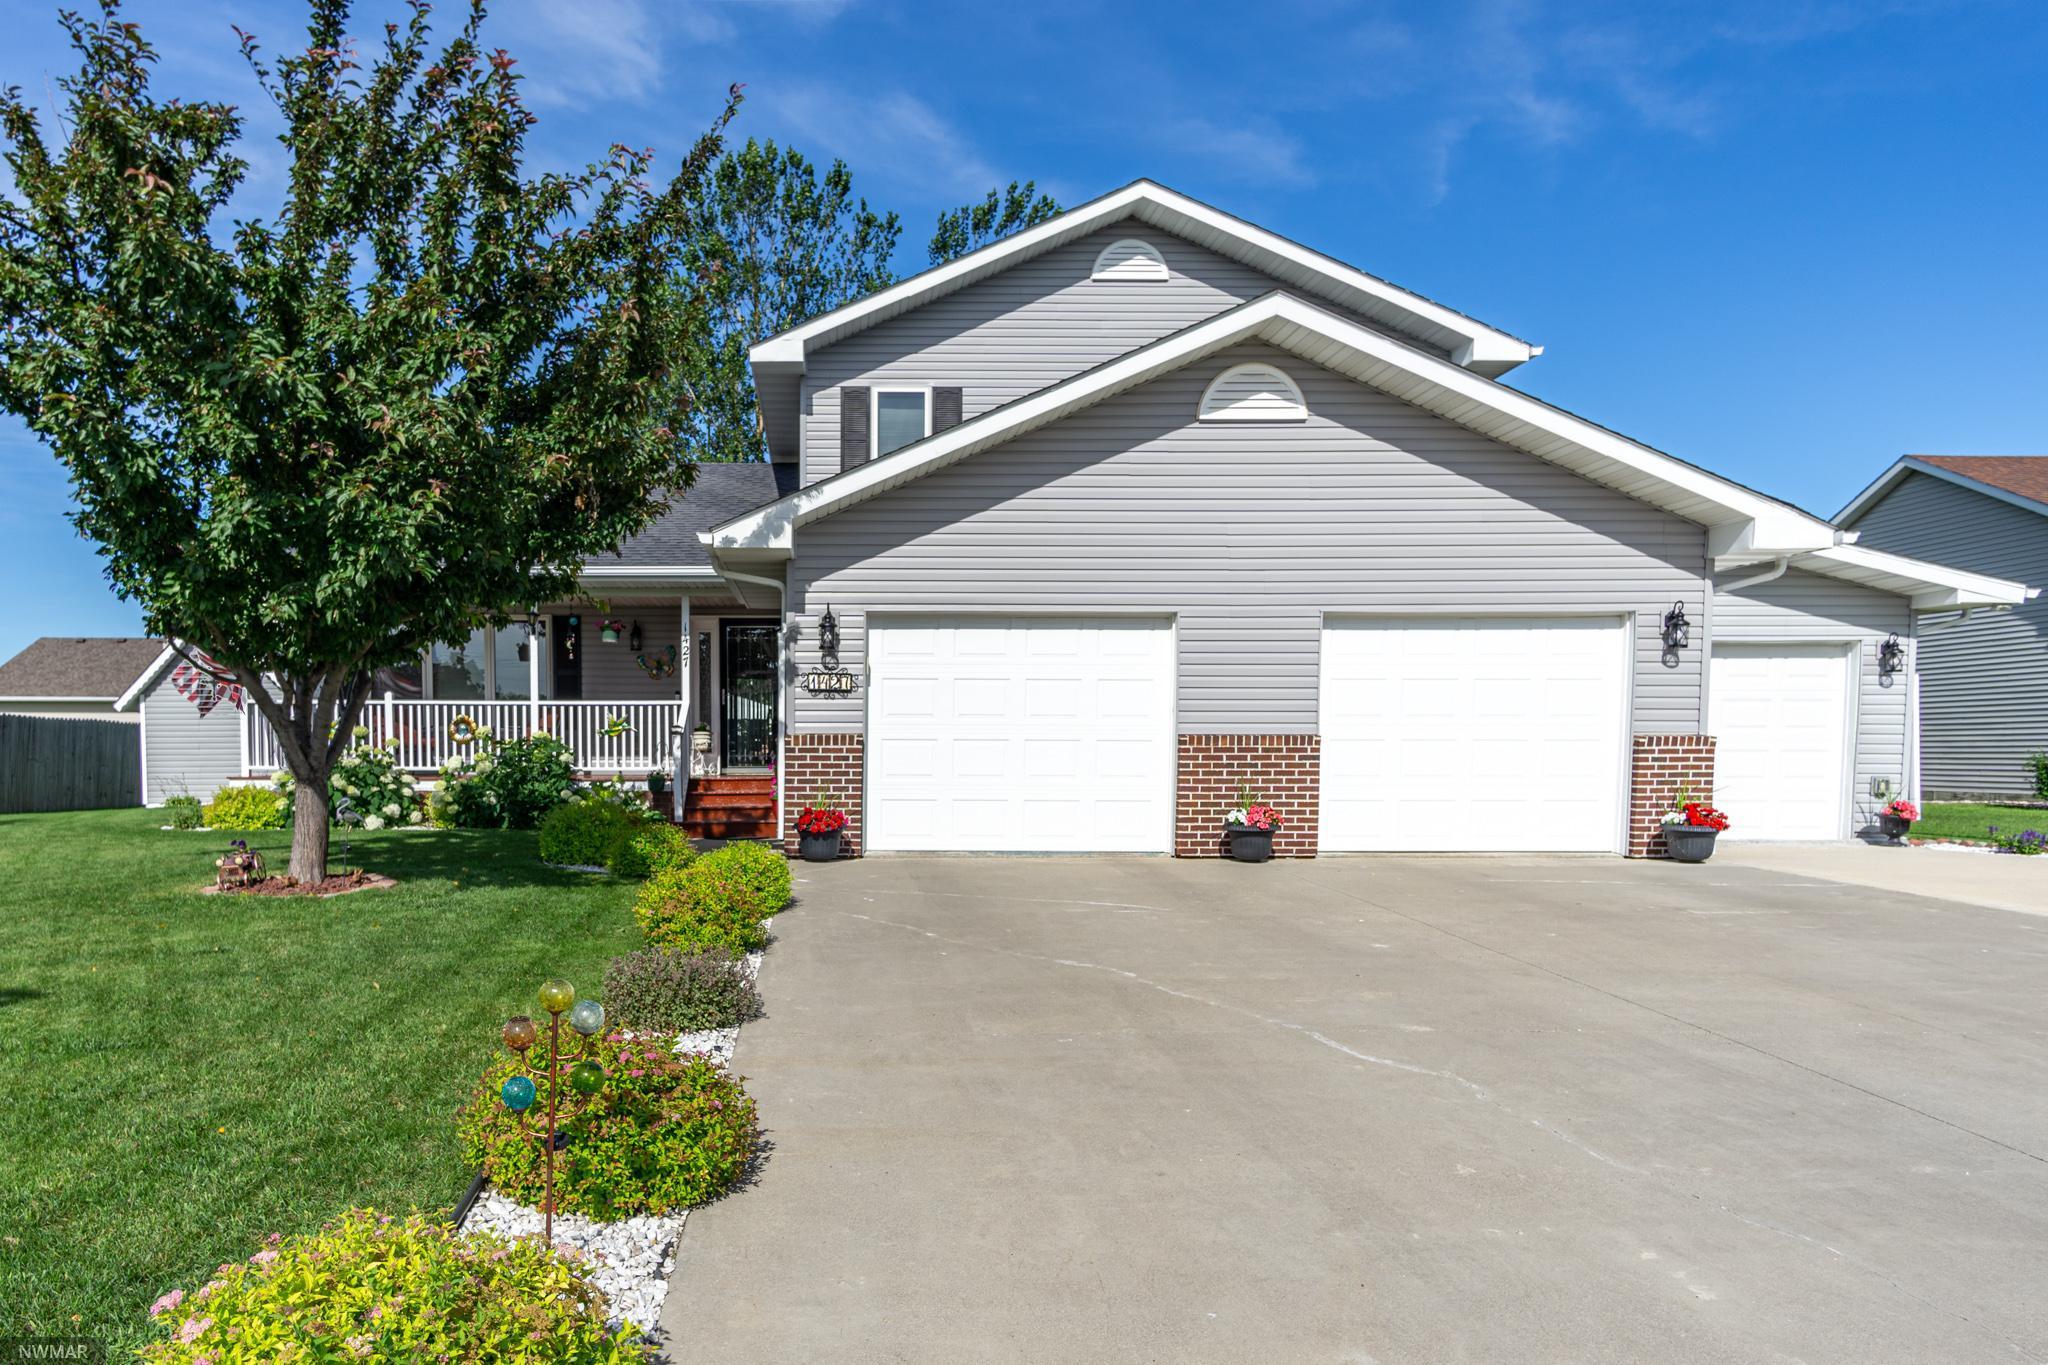 1427 Saint Johns Property Photo - Crookston, MN real estate listing